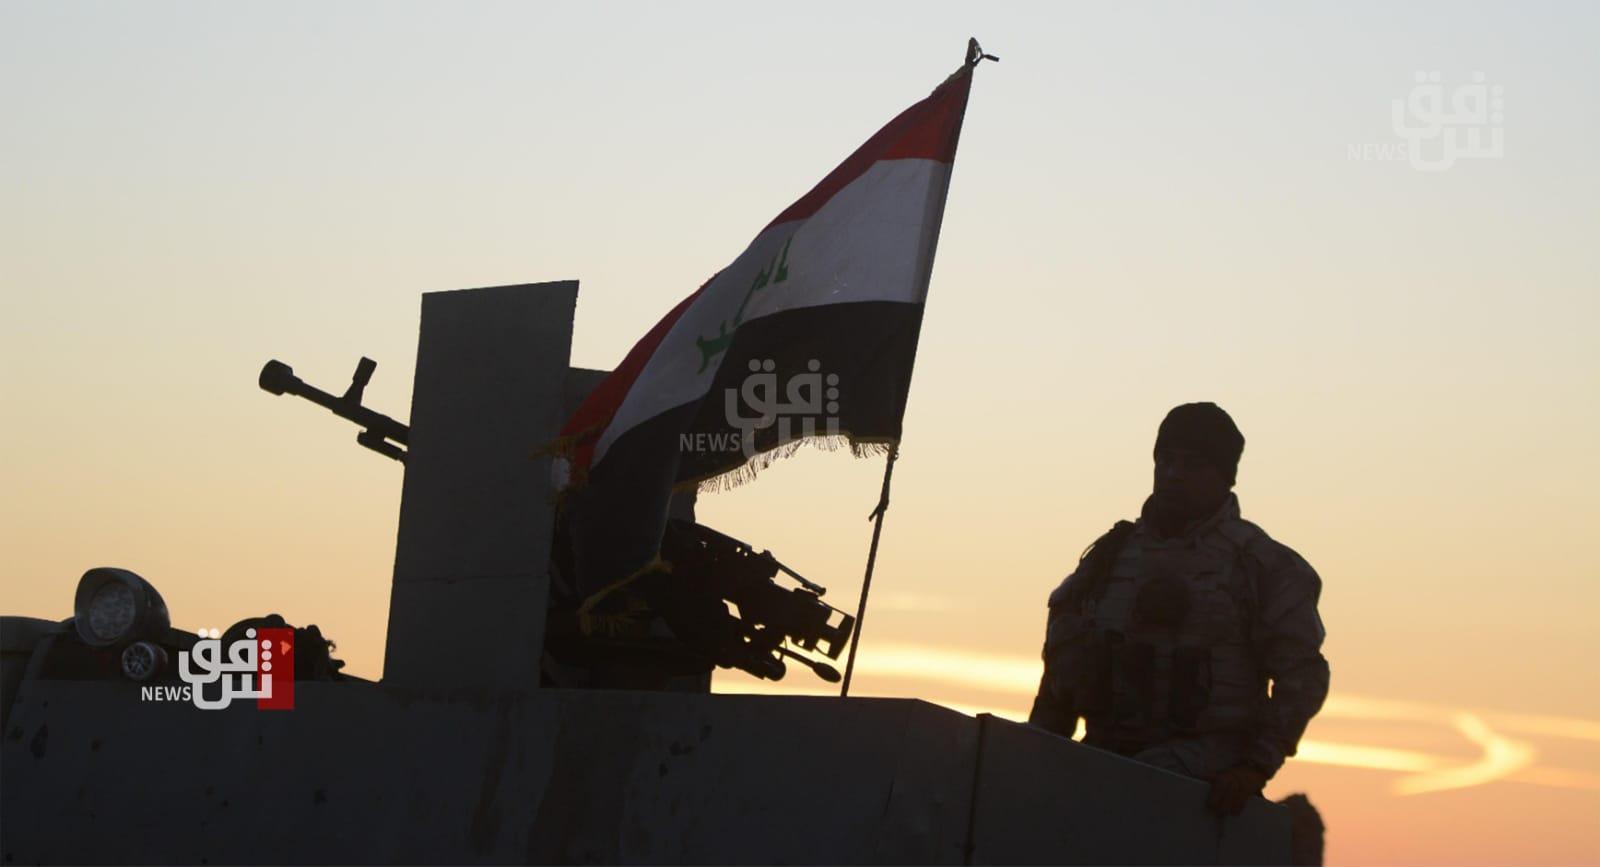 کوشیان ئەفسەریگ لە سوپای عراق وە پەلاماریگ چەکدار